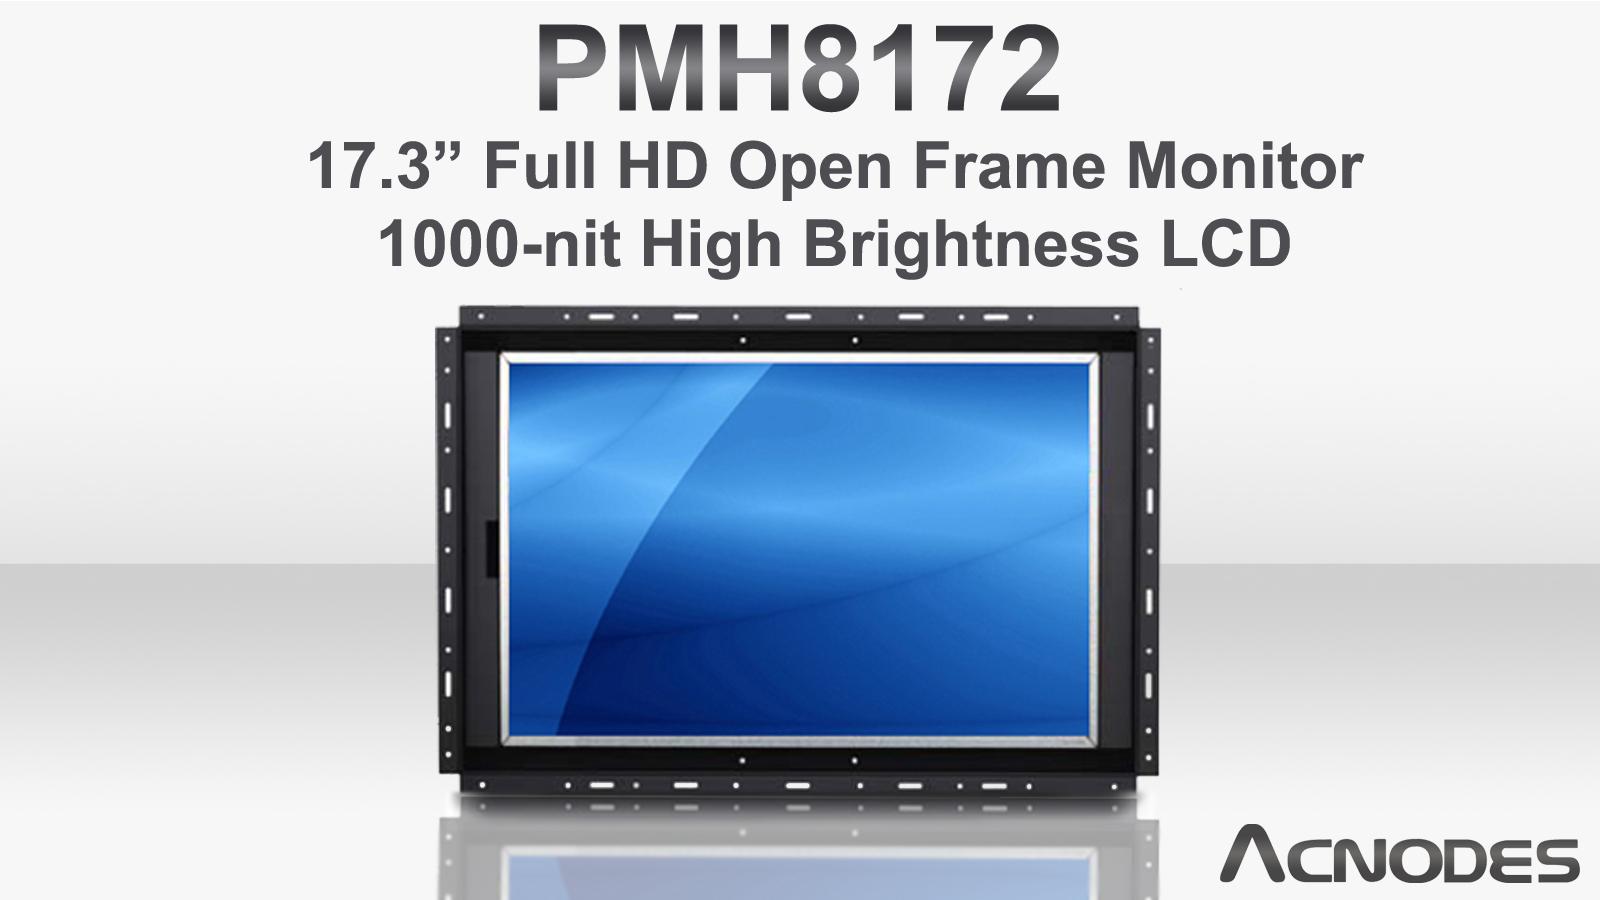 PMH8172